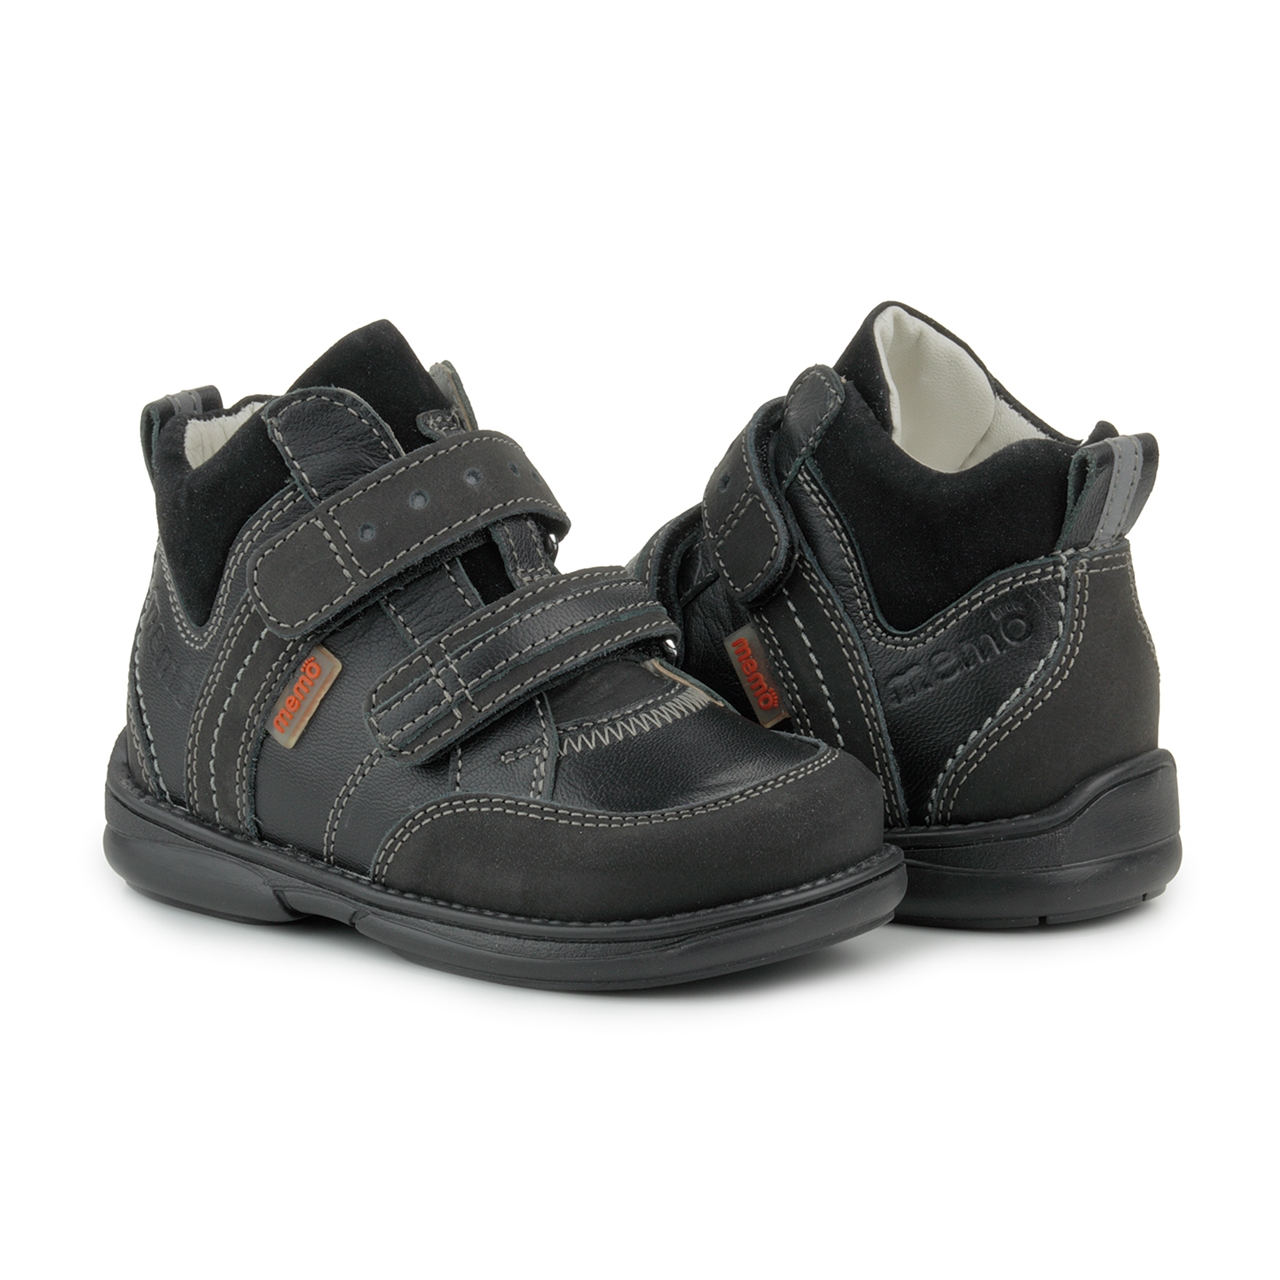 Memo Polo Junior 3LY Black Toddler Girl